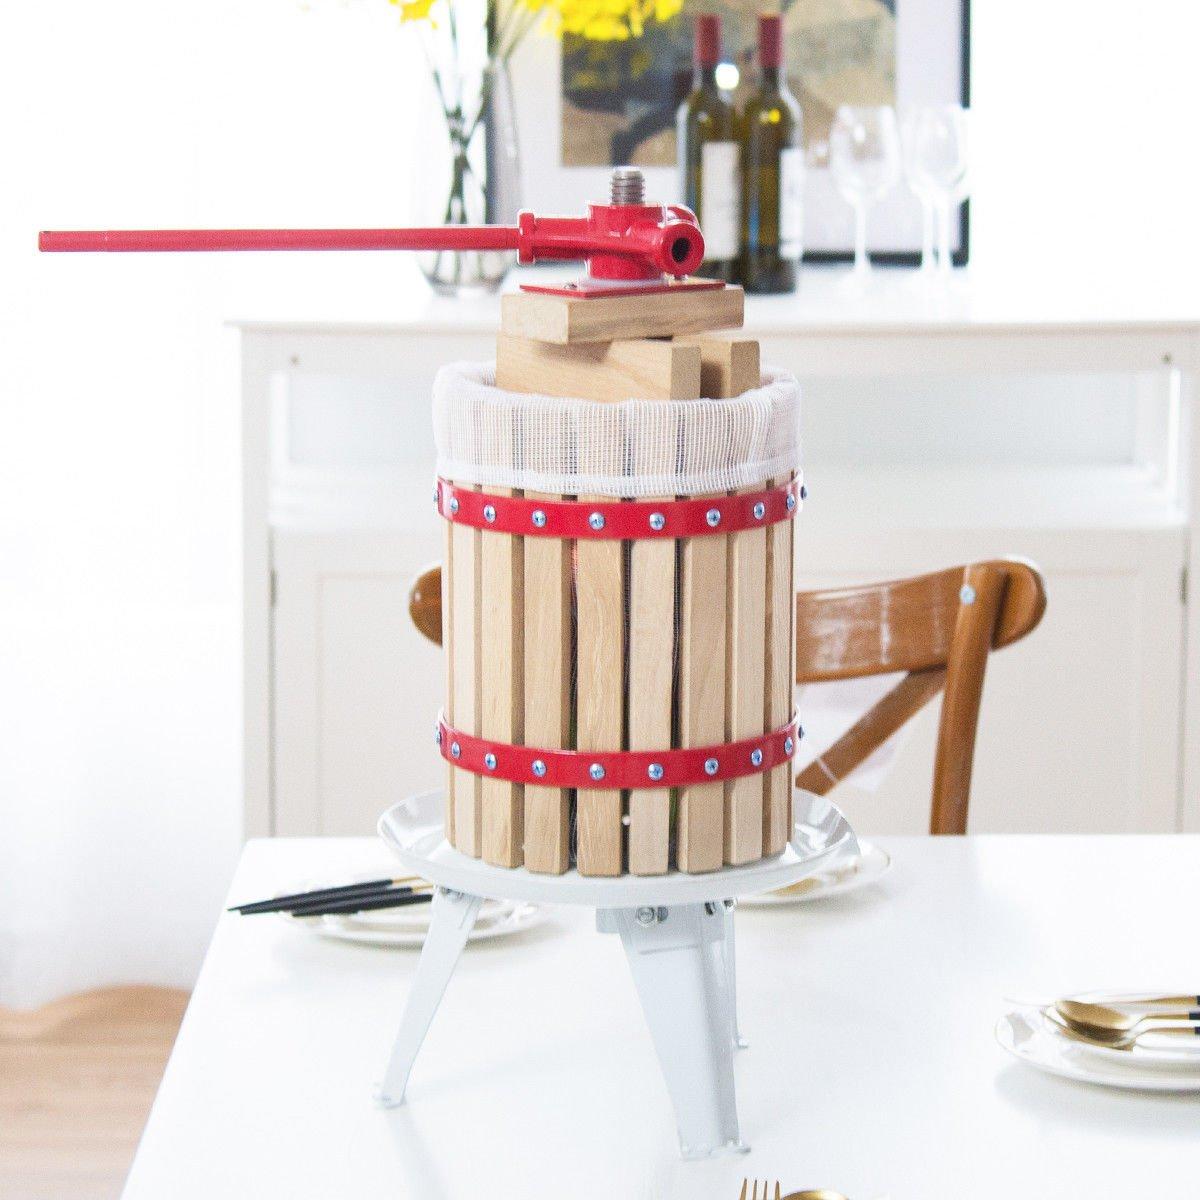 Costzon 1.6 Gallon (6 Liter) Fruit Wine Press Cider Apple Grape Crusher Juice Maker Tool Wood